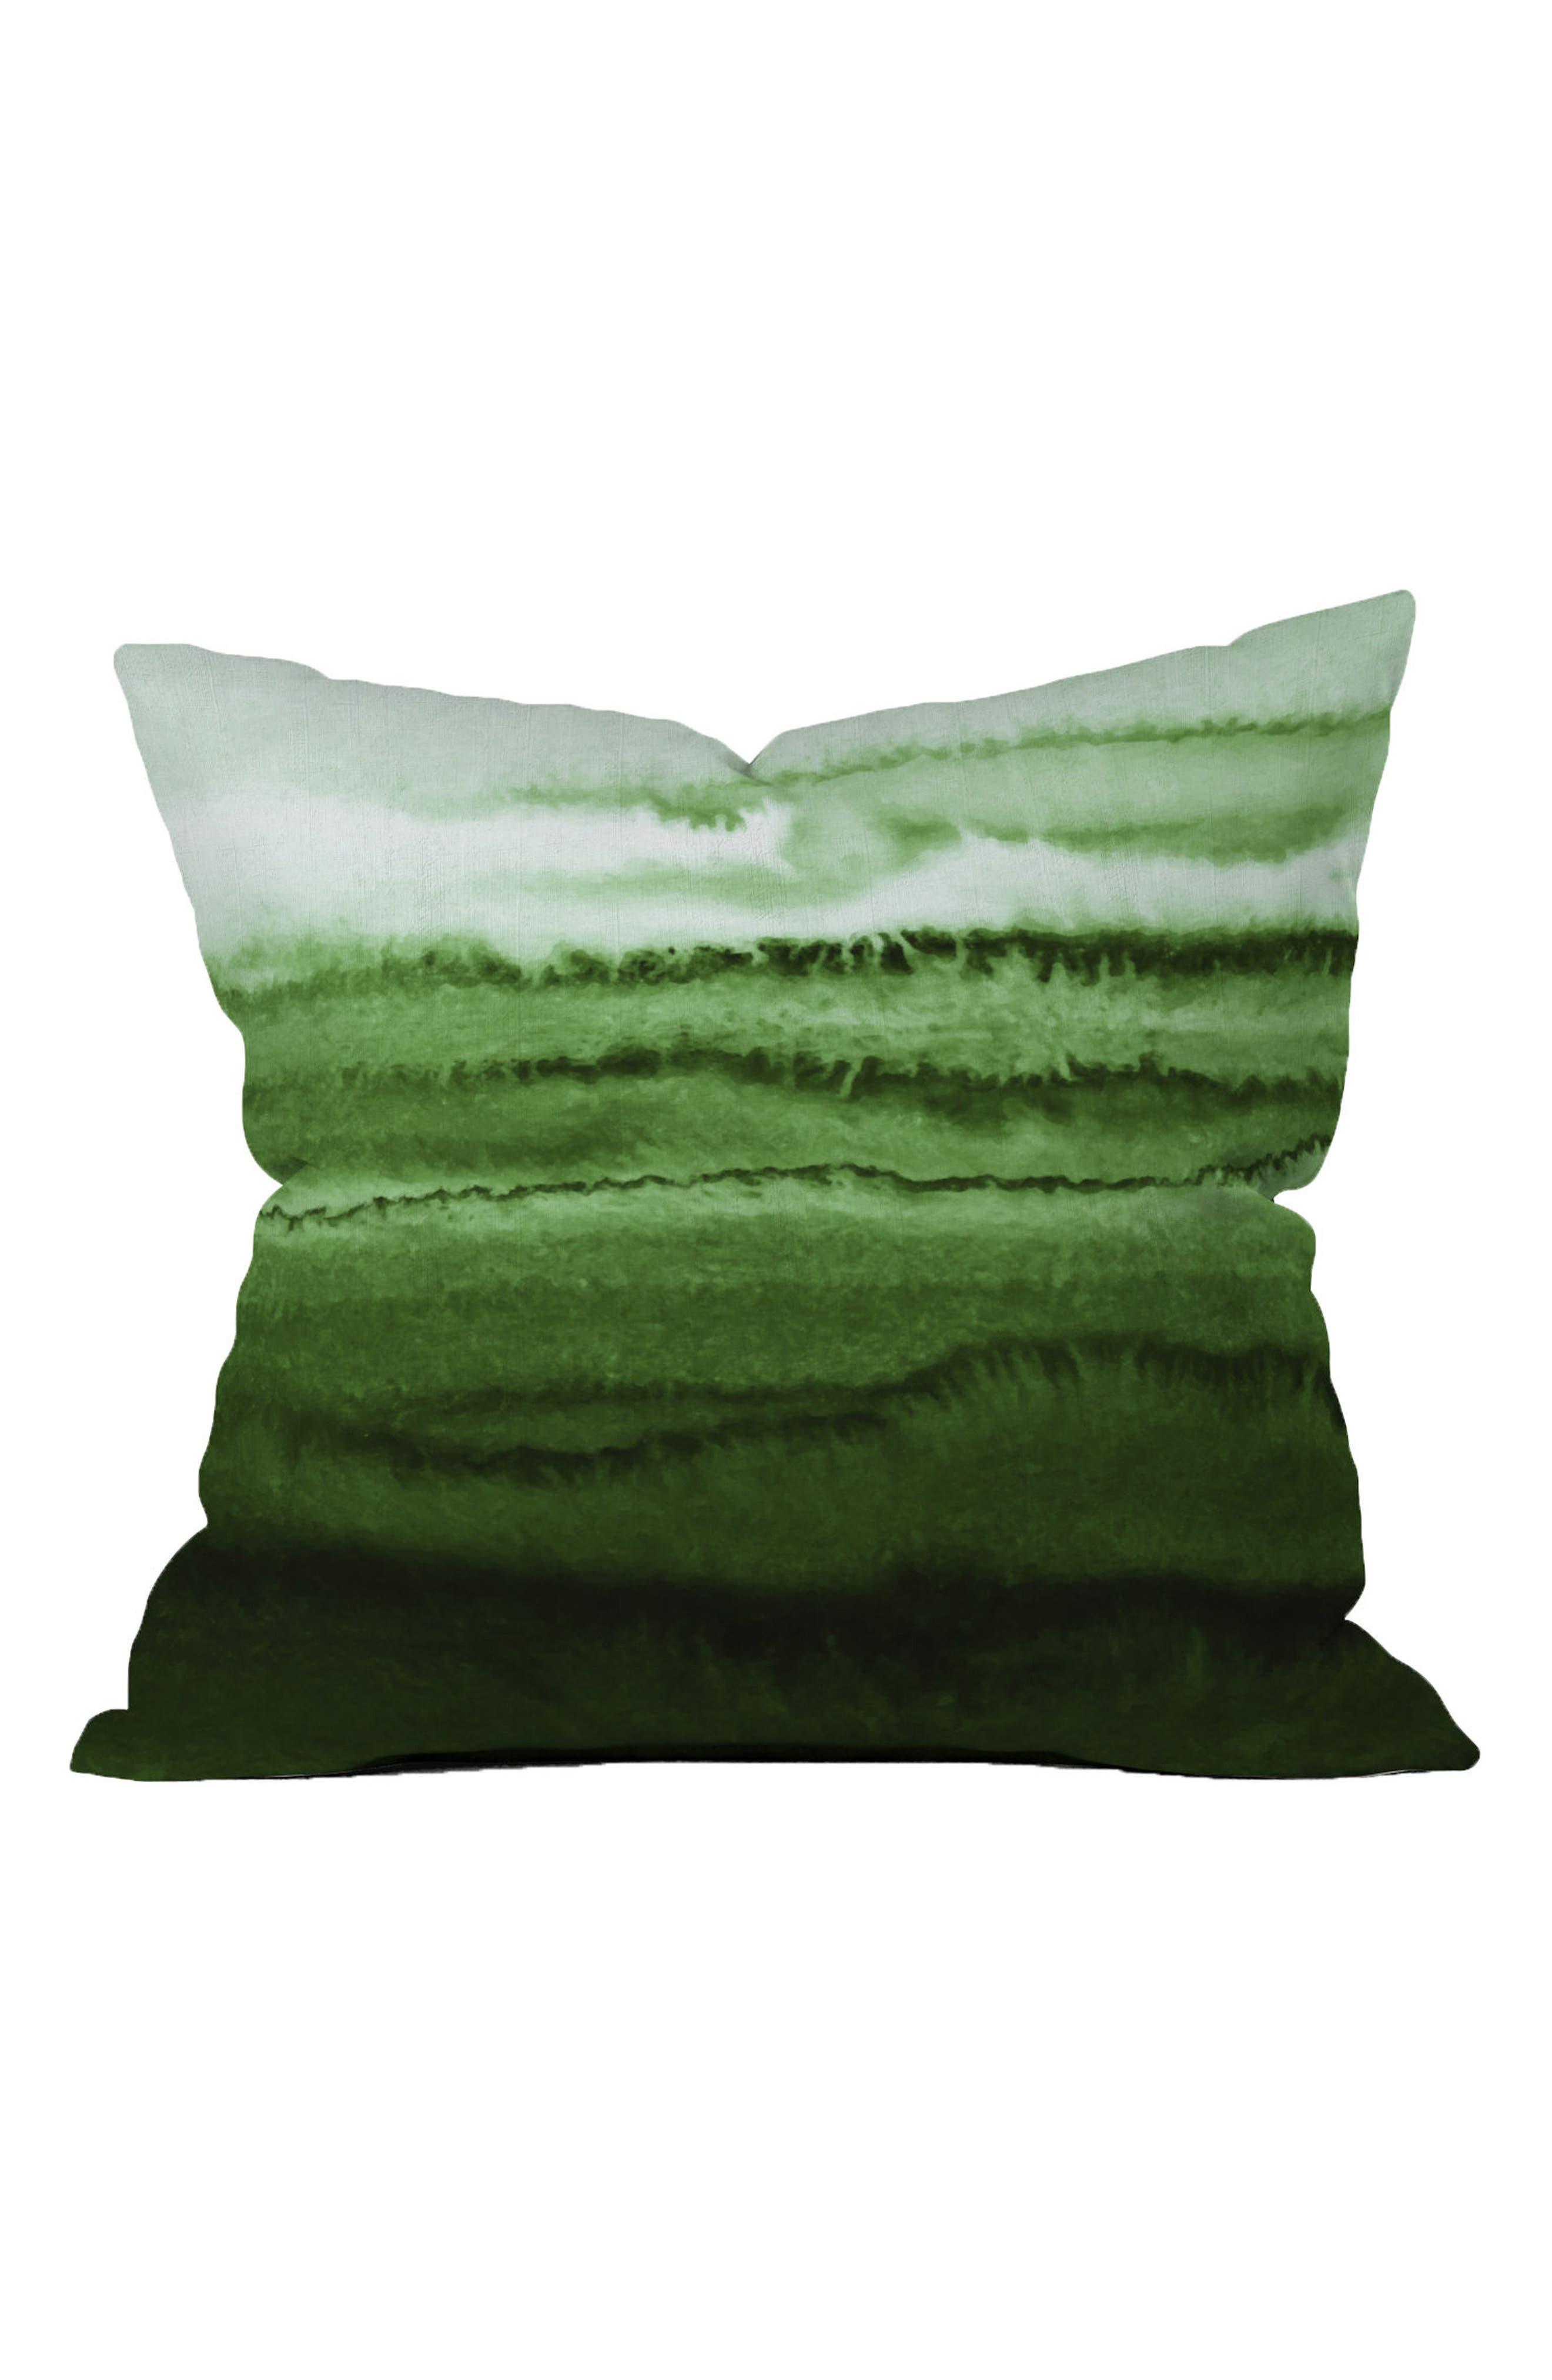 Deny Designs Monika Strigel Accent Pillow